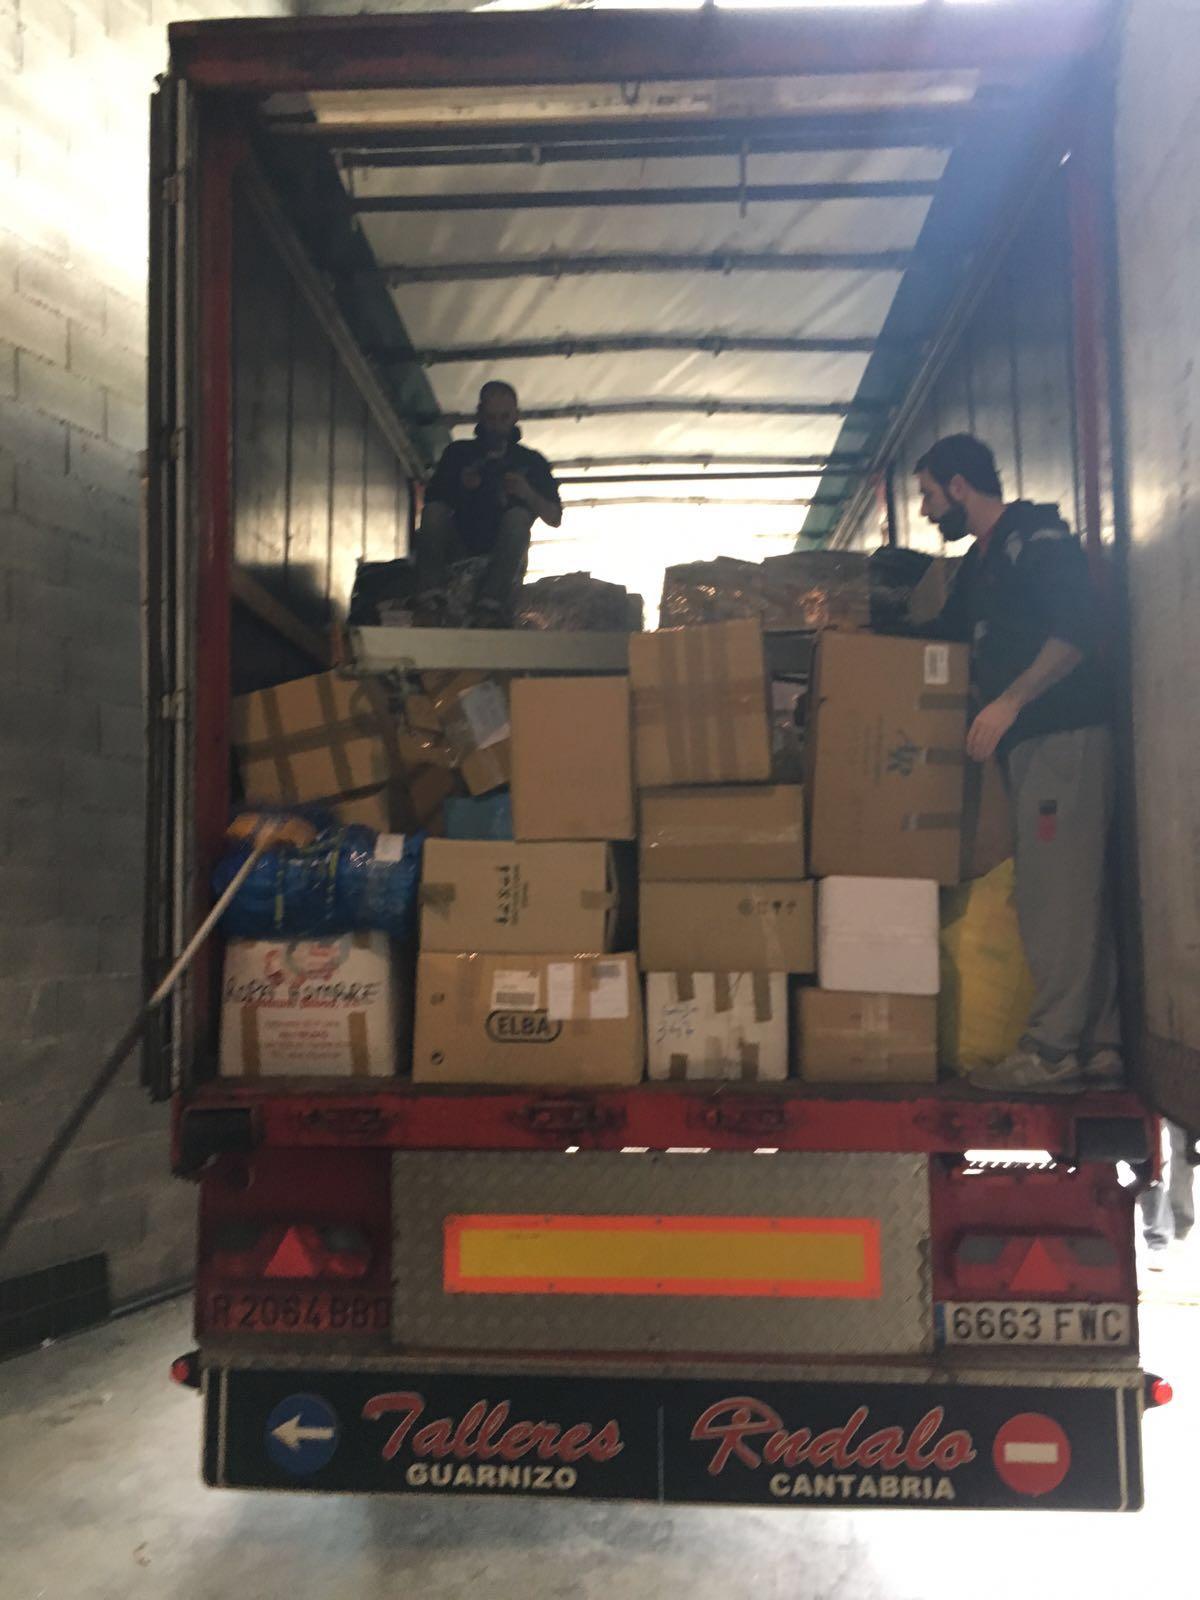 Un camión cargado de materiai para Lesbos que fue posible gracias a iniciativas de cántabros